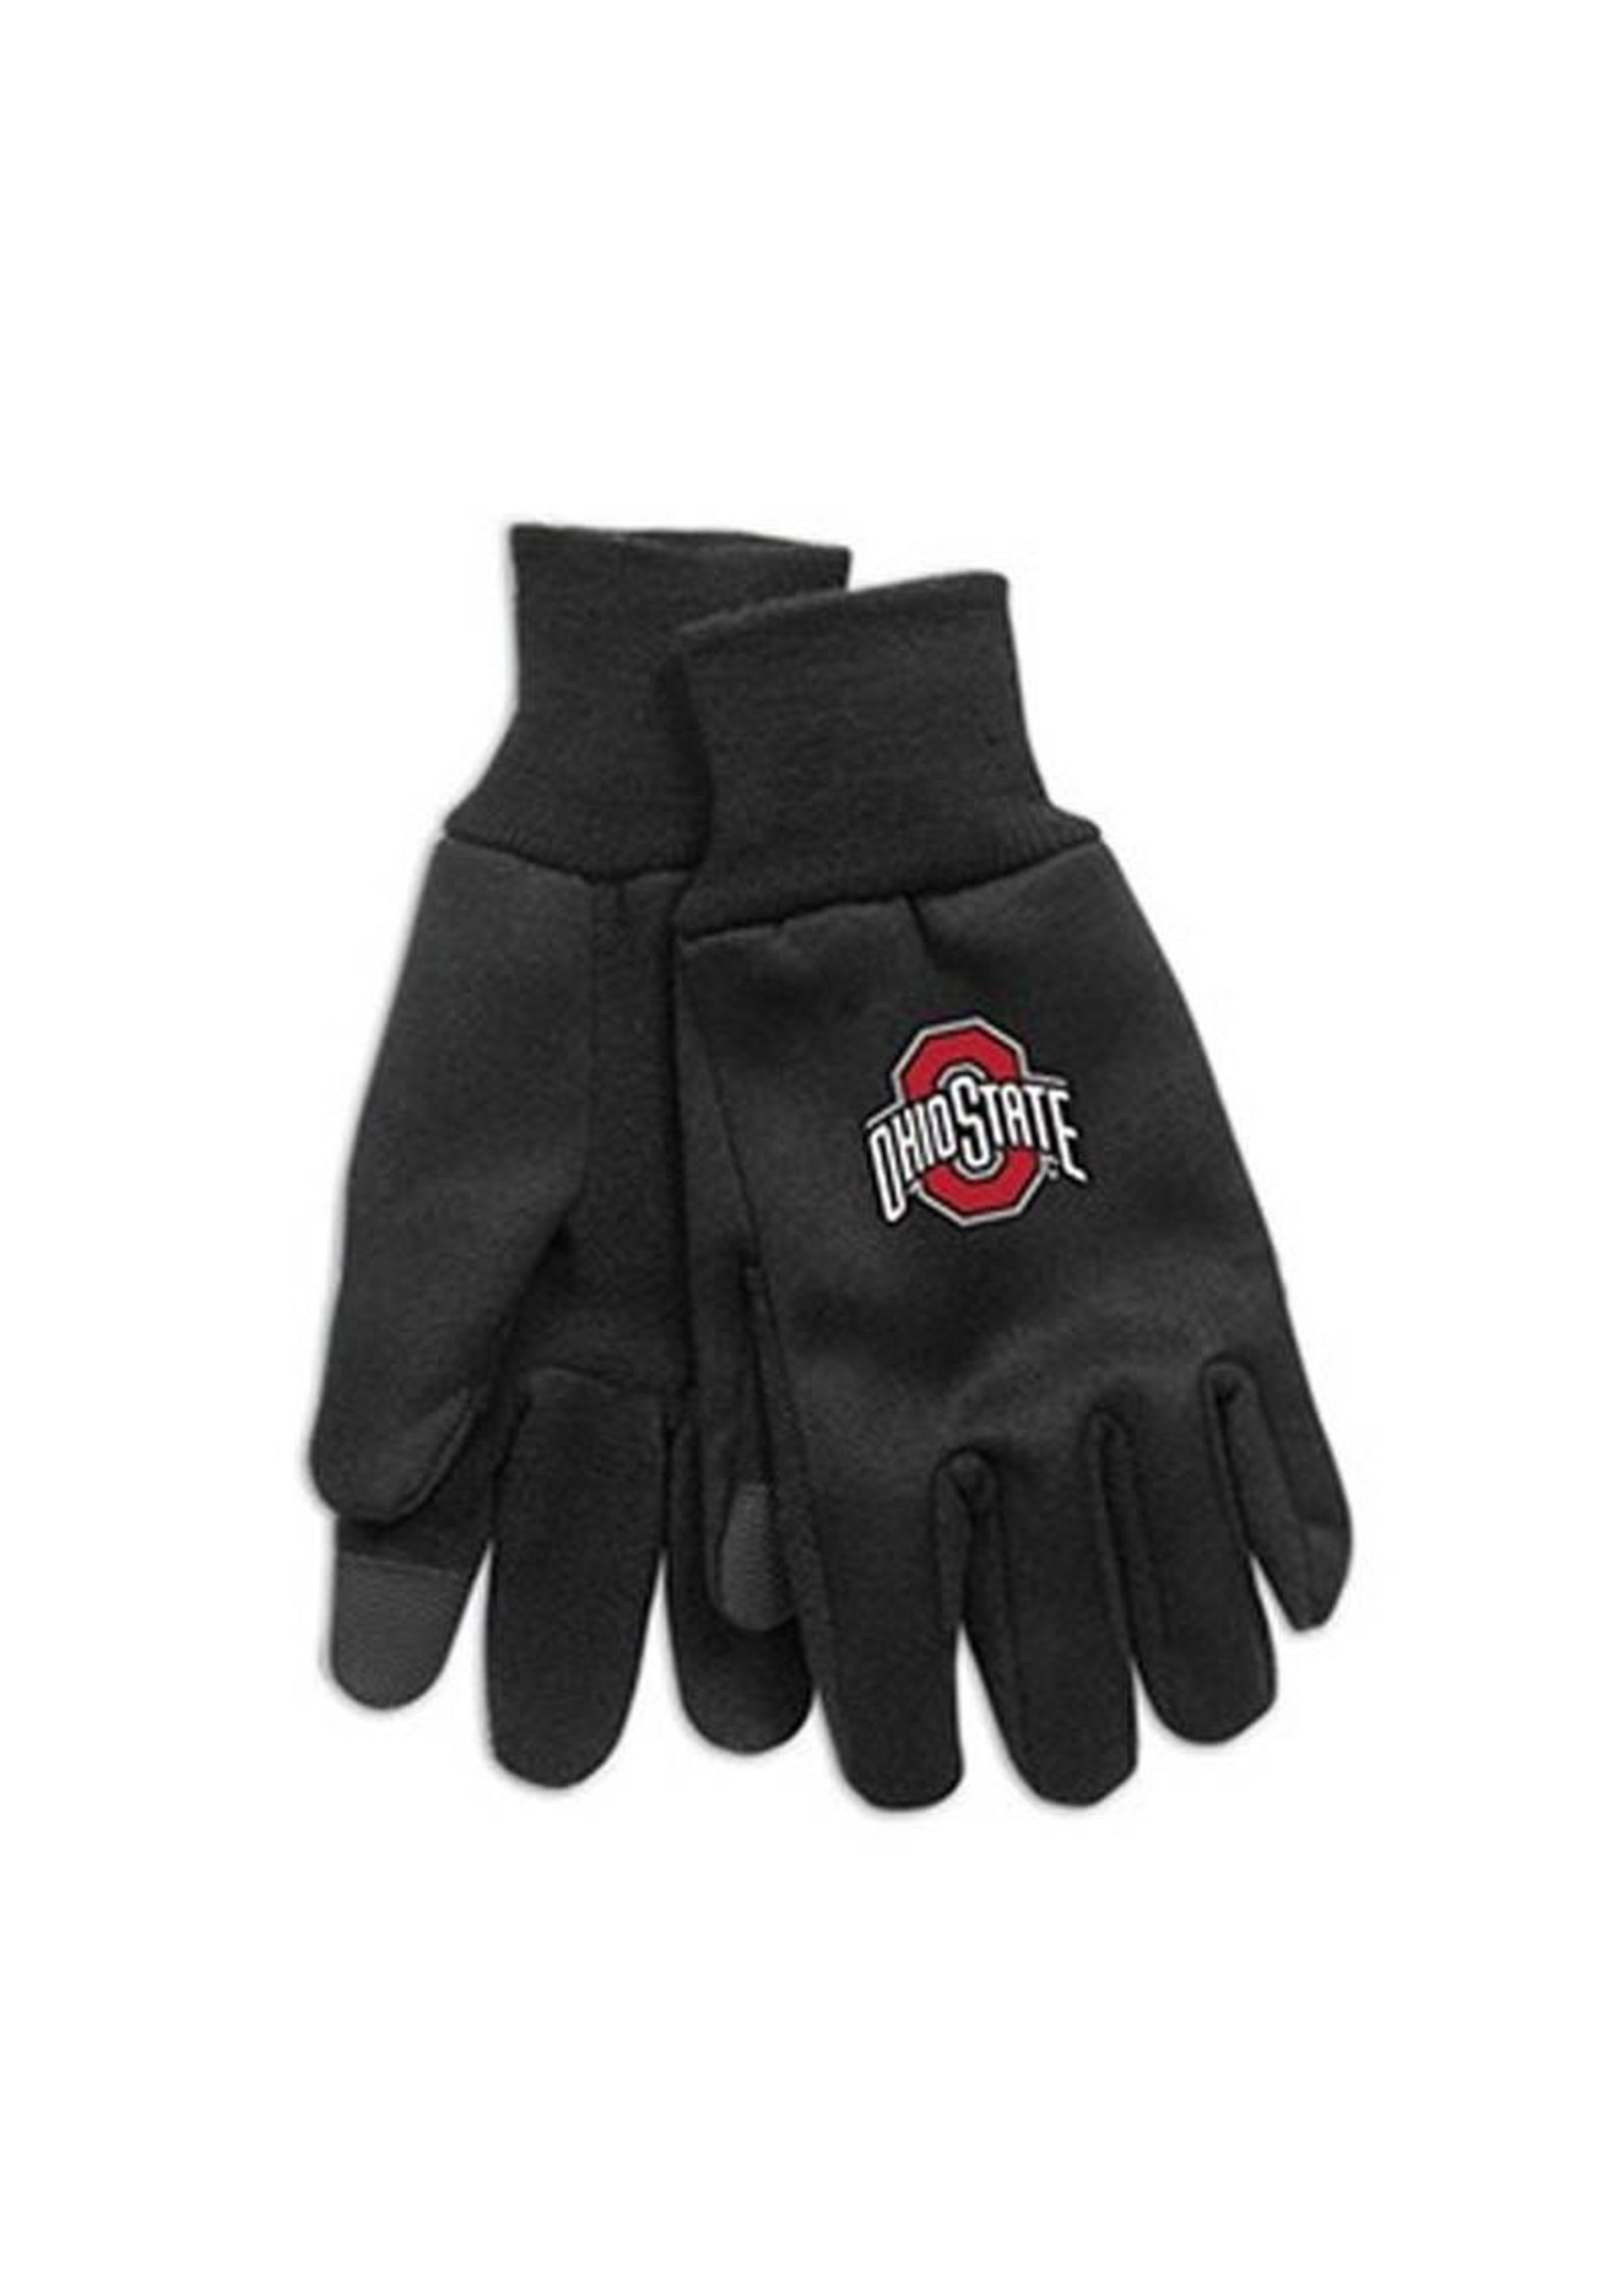 Wincraft Ohio State University Tech Gloves